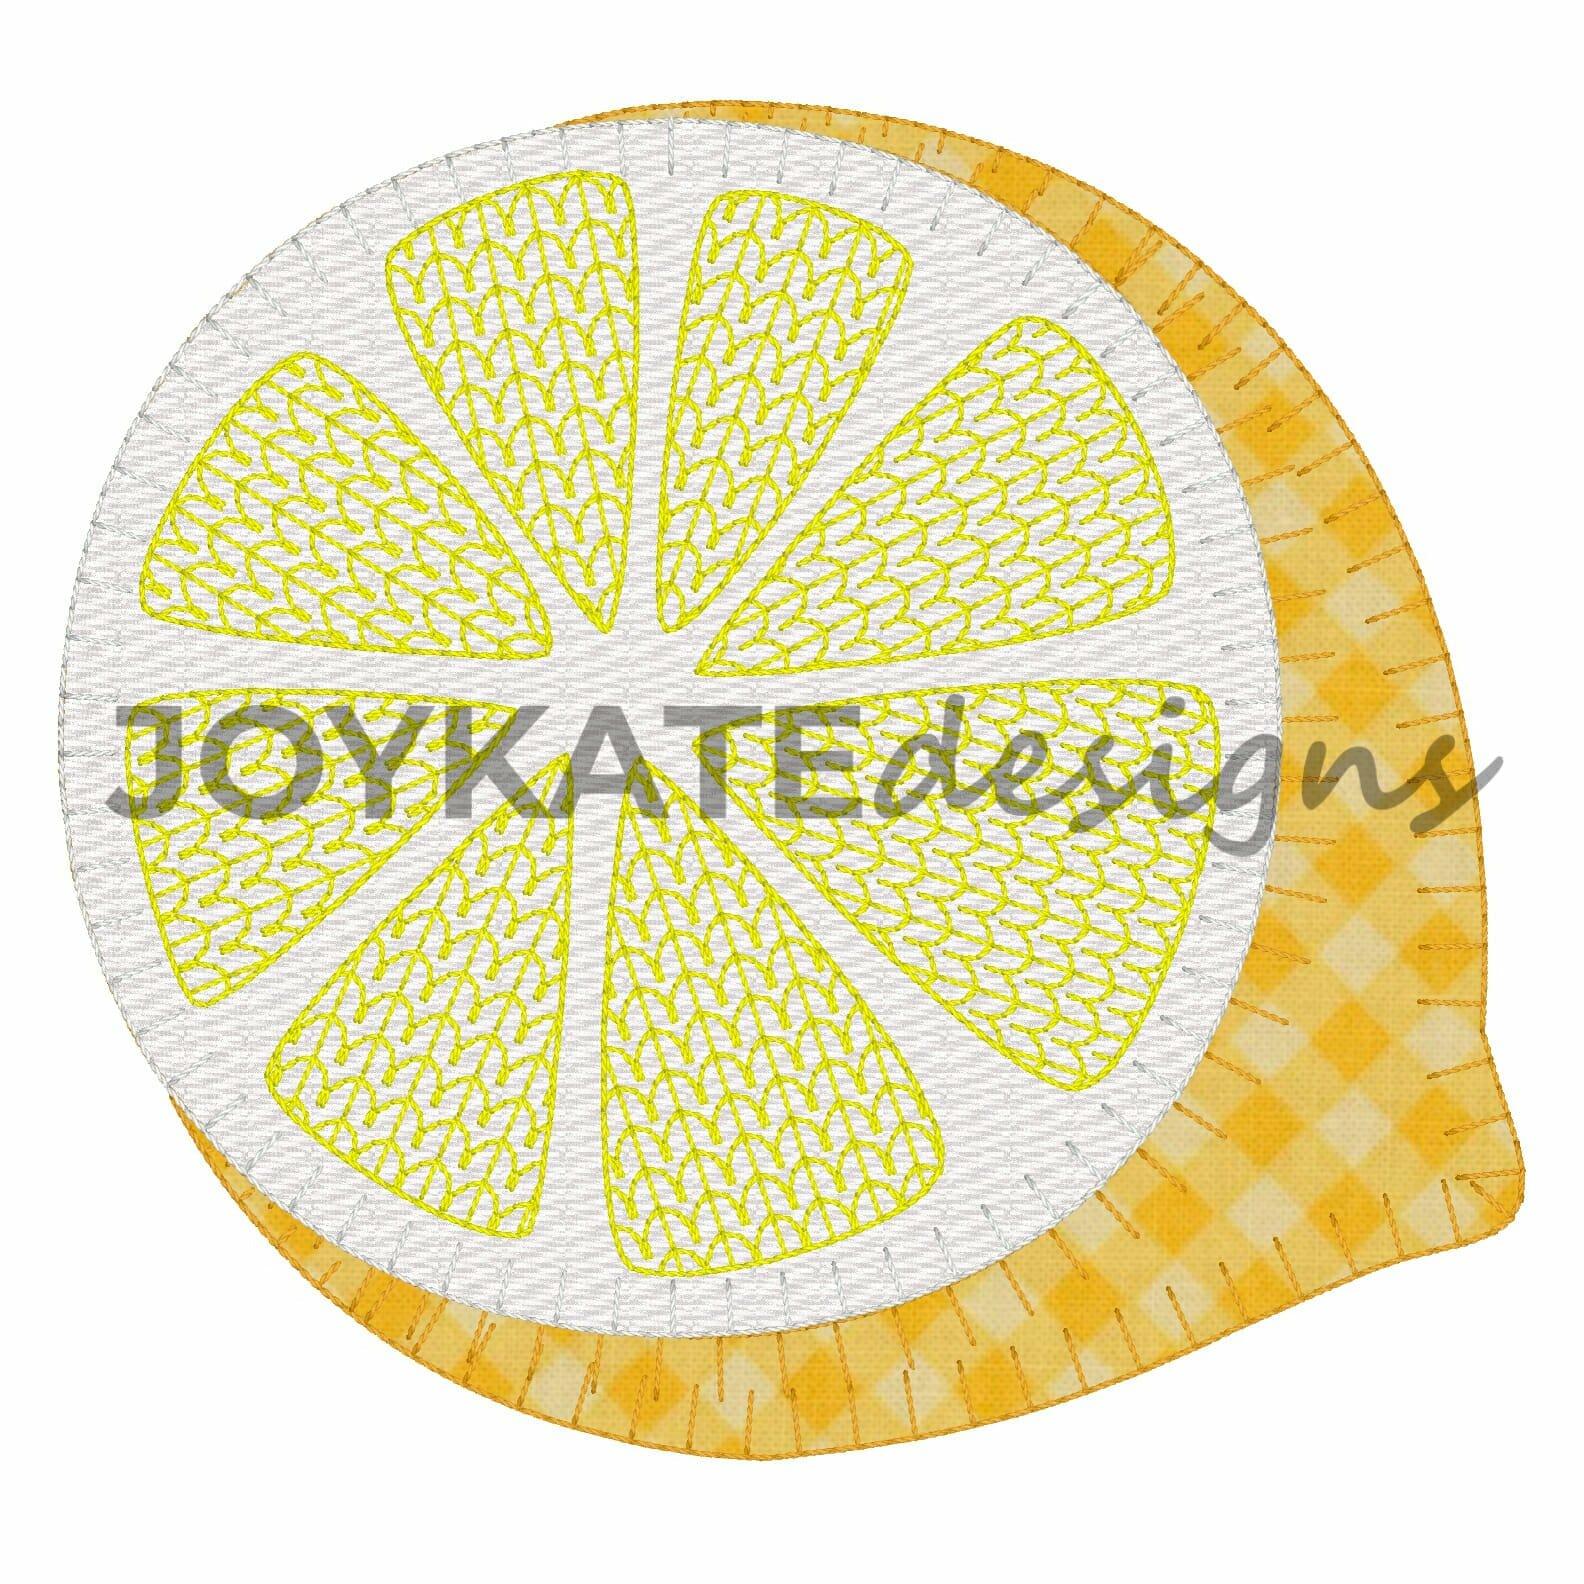 Blanket Stitch Lemon Applique Embroidery Design Joy Kate Designs